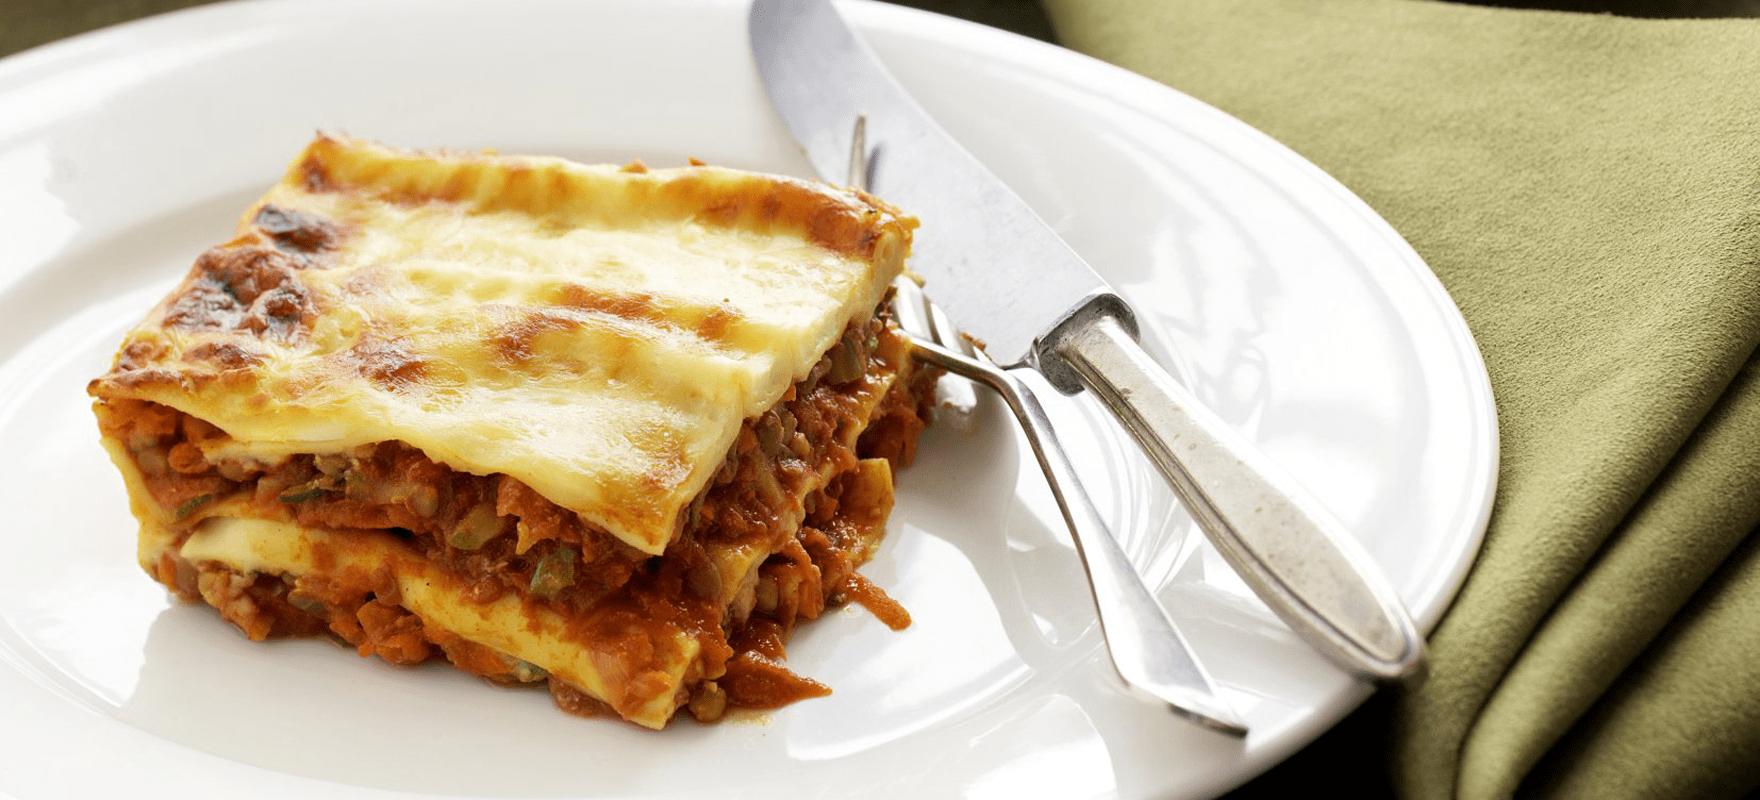 Curried Vegetable And Lentil Lasagne